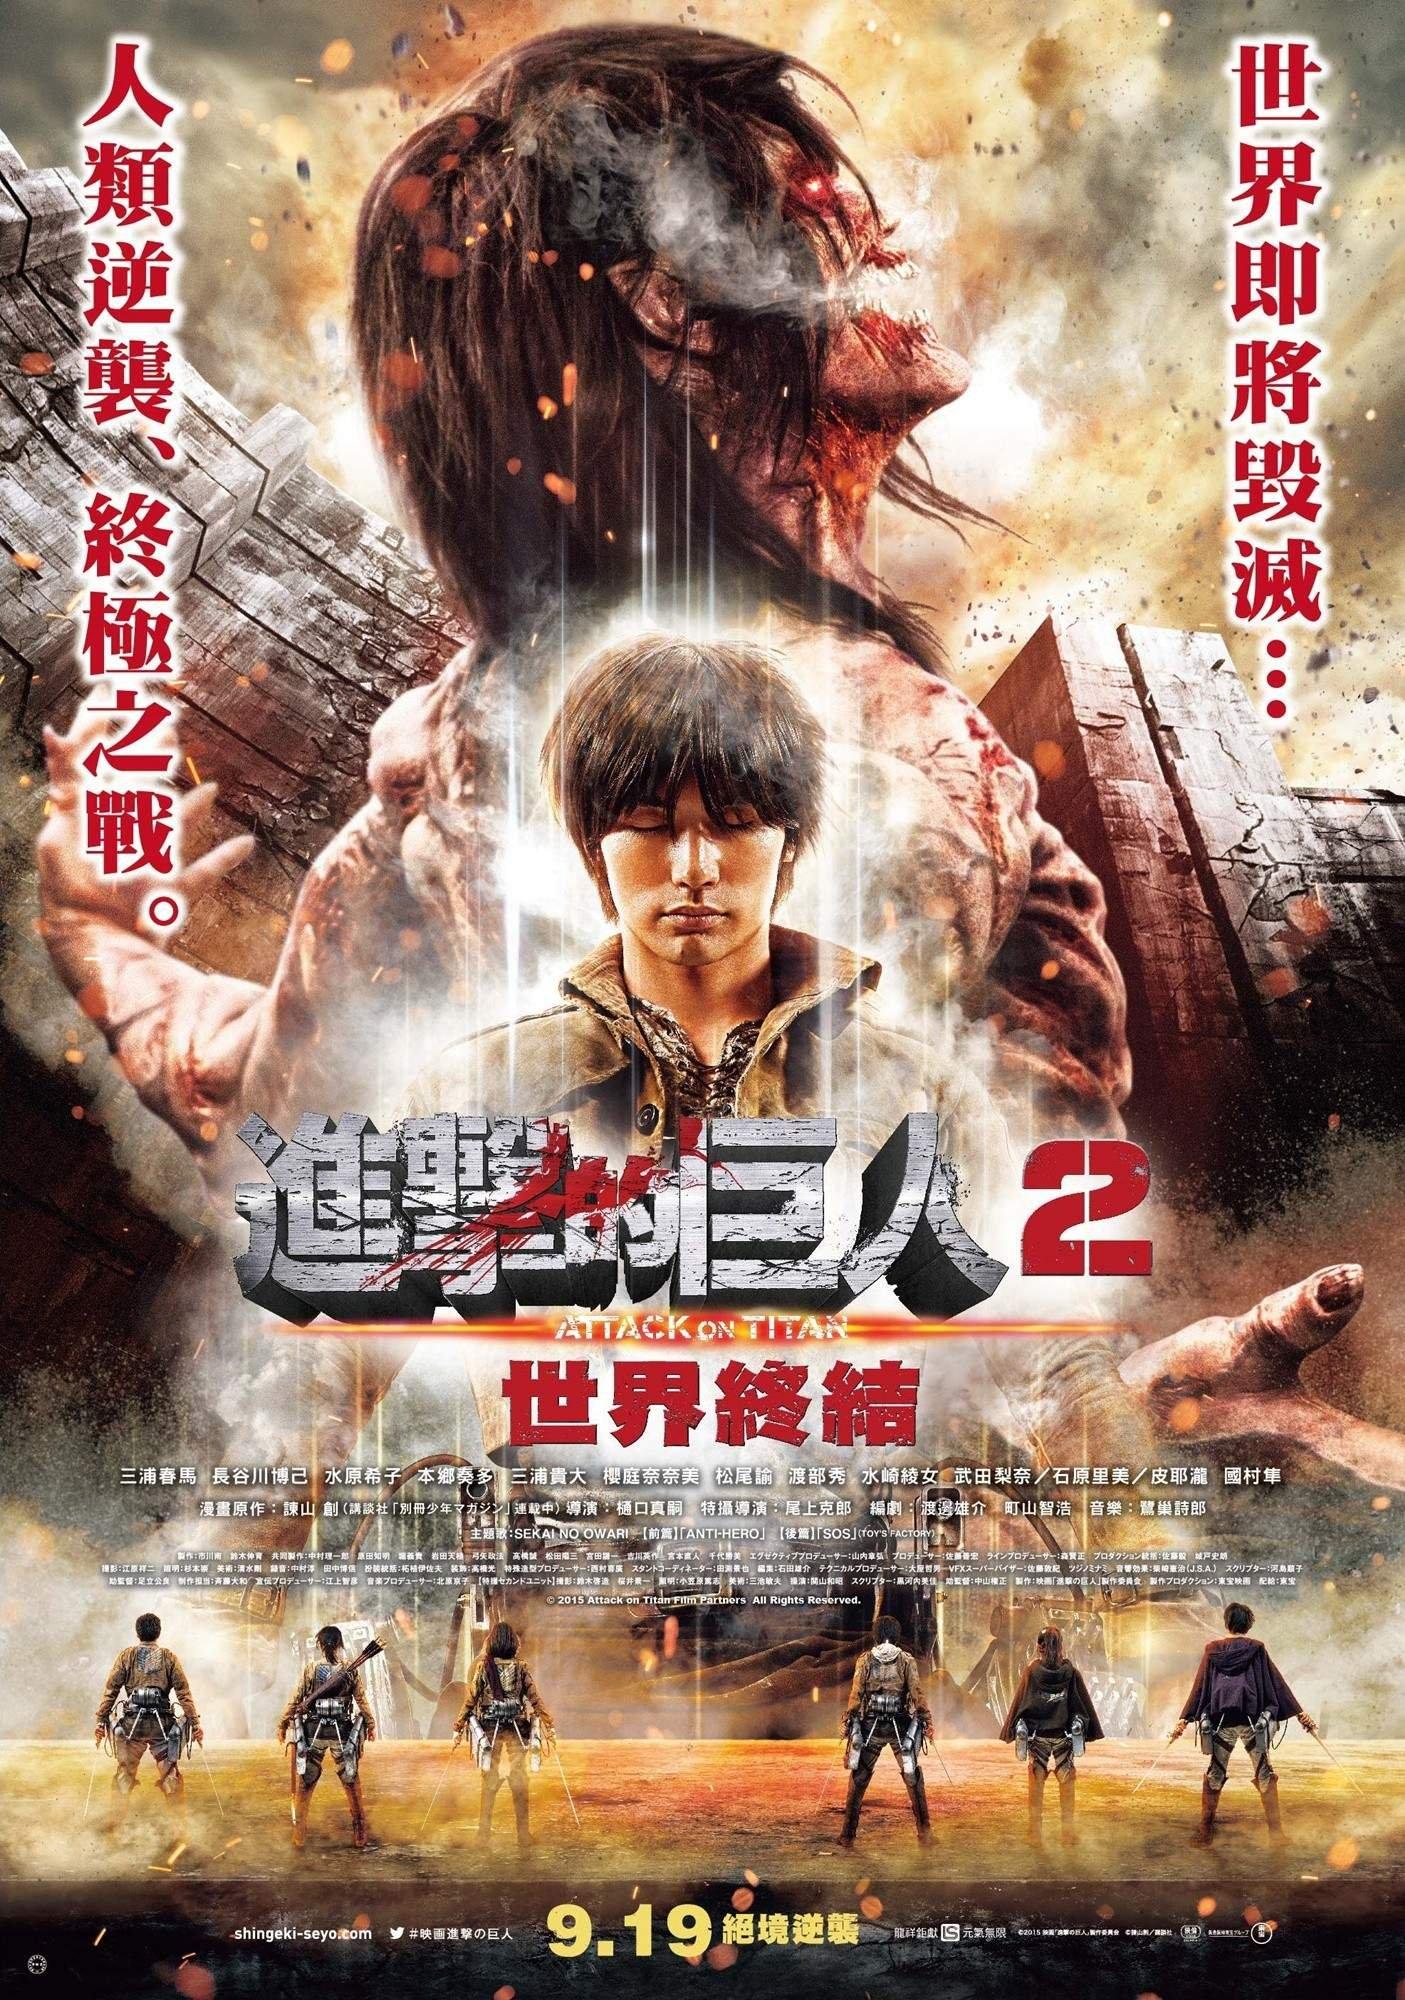 attack on titan full movie download mp4